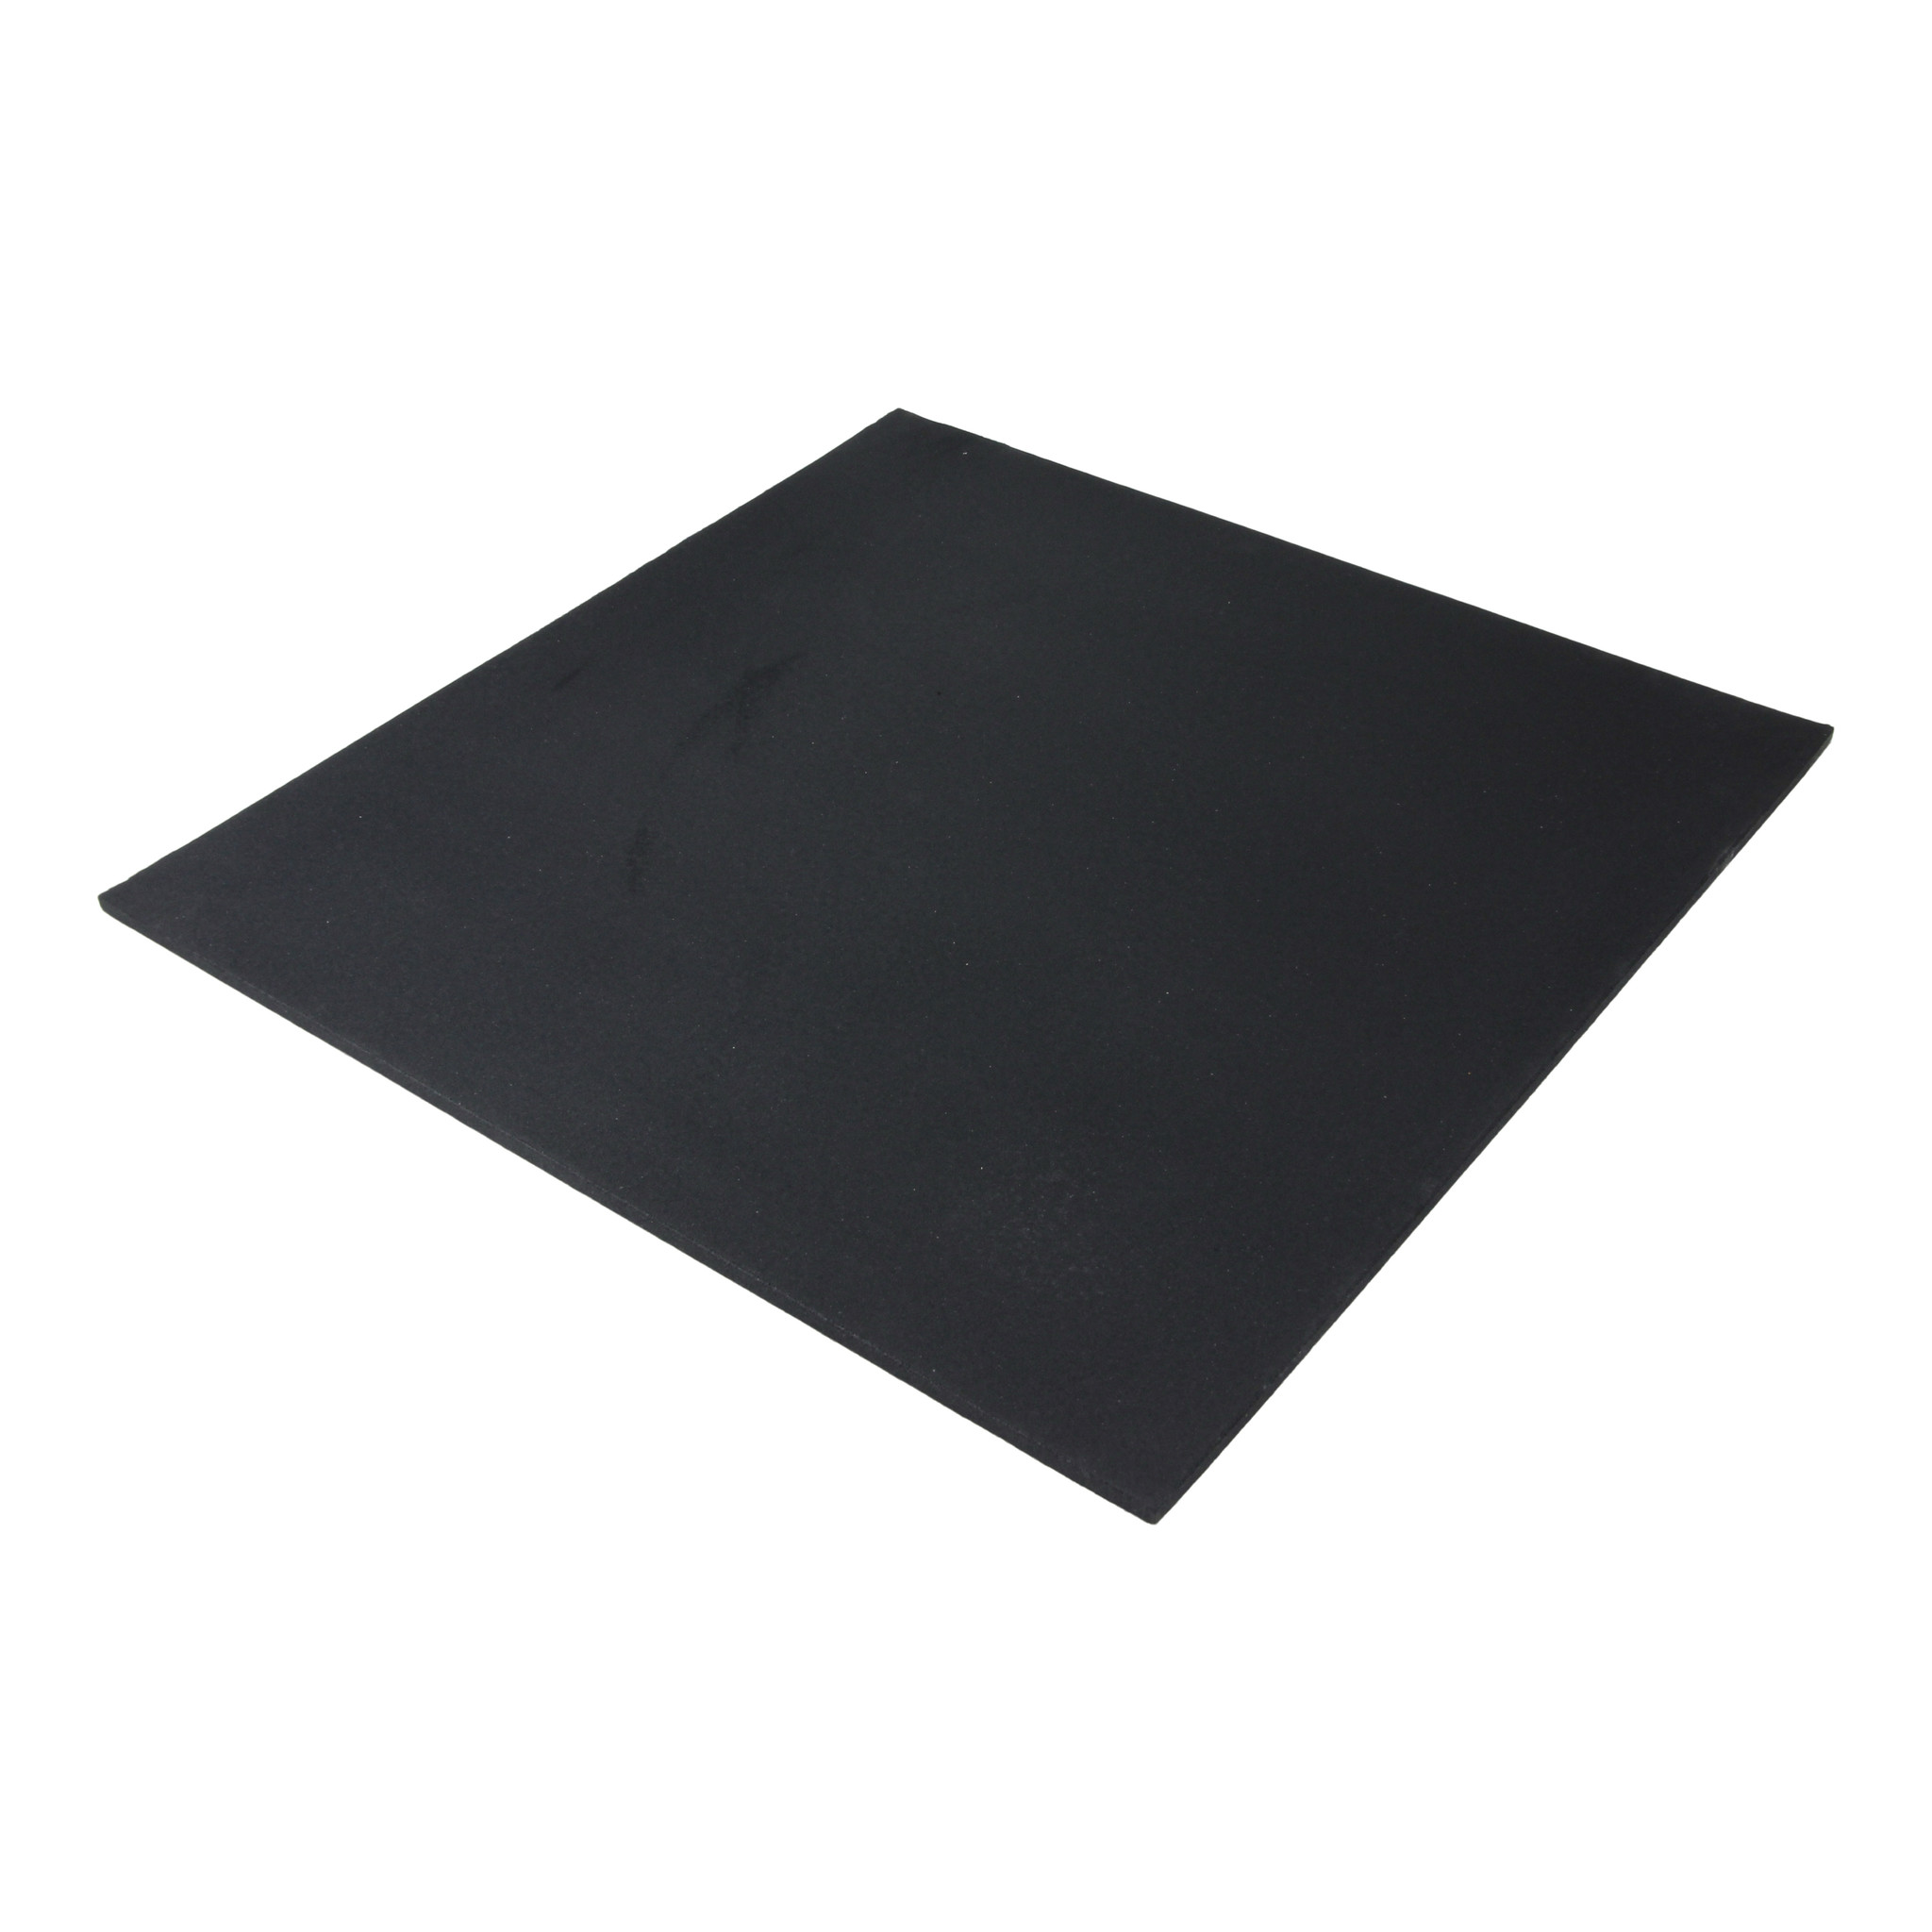 Lifemaxx® LMX1341 Rubber tile fine granulate 100x100x2cm